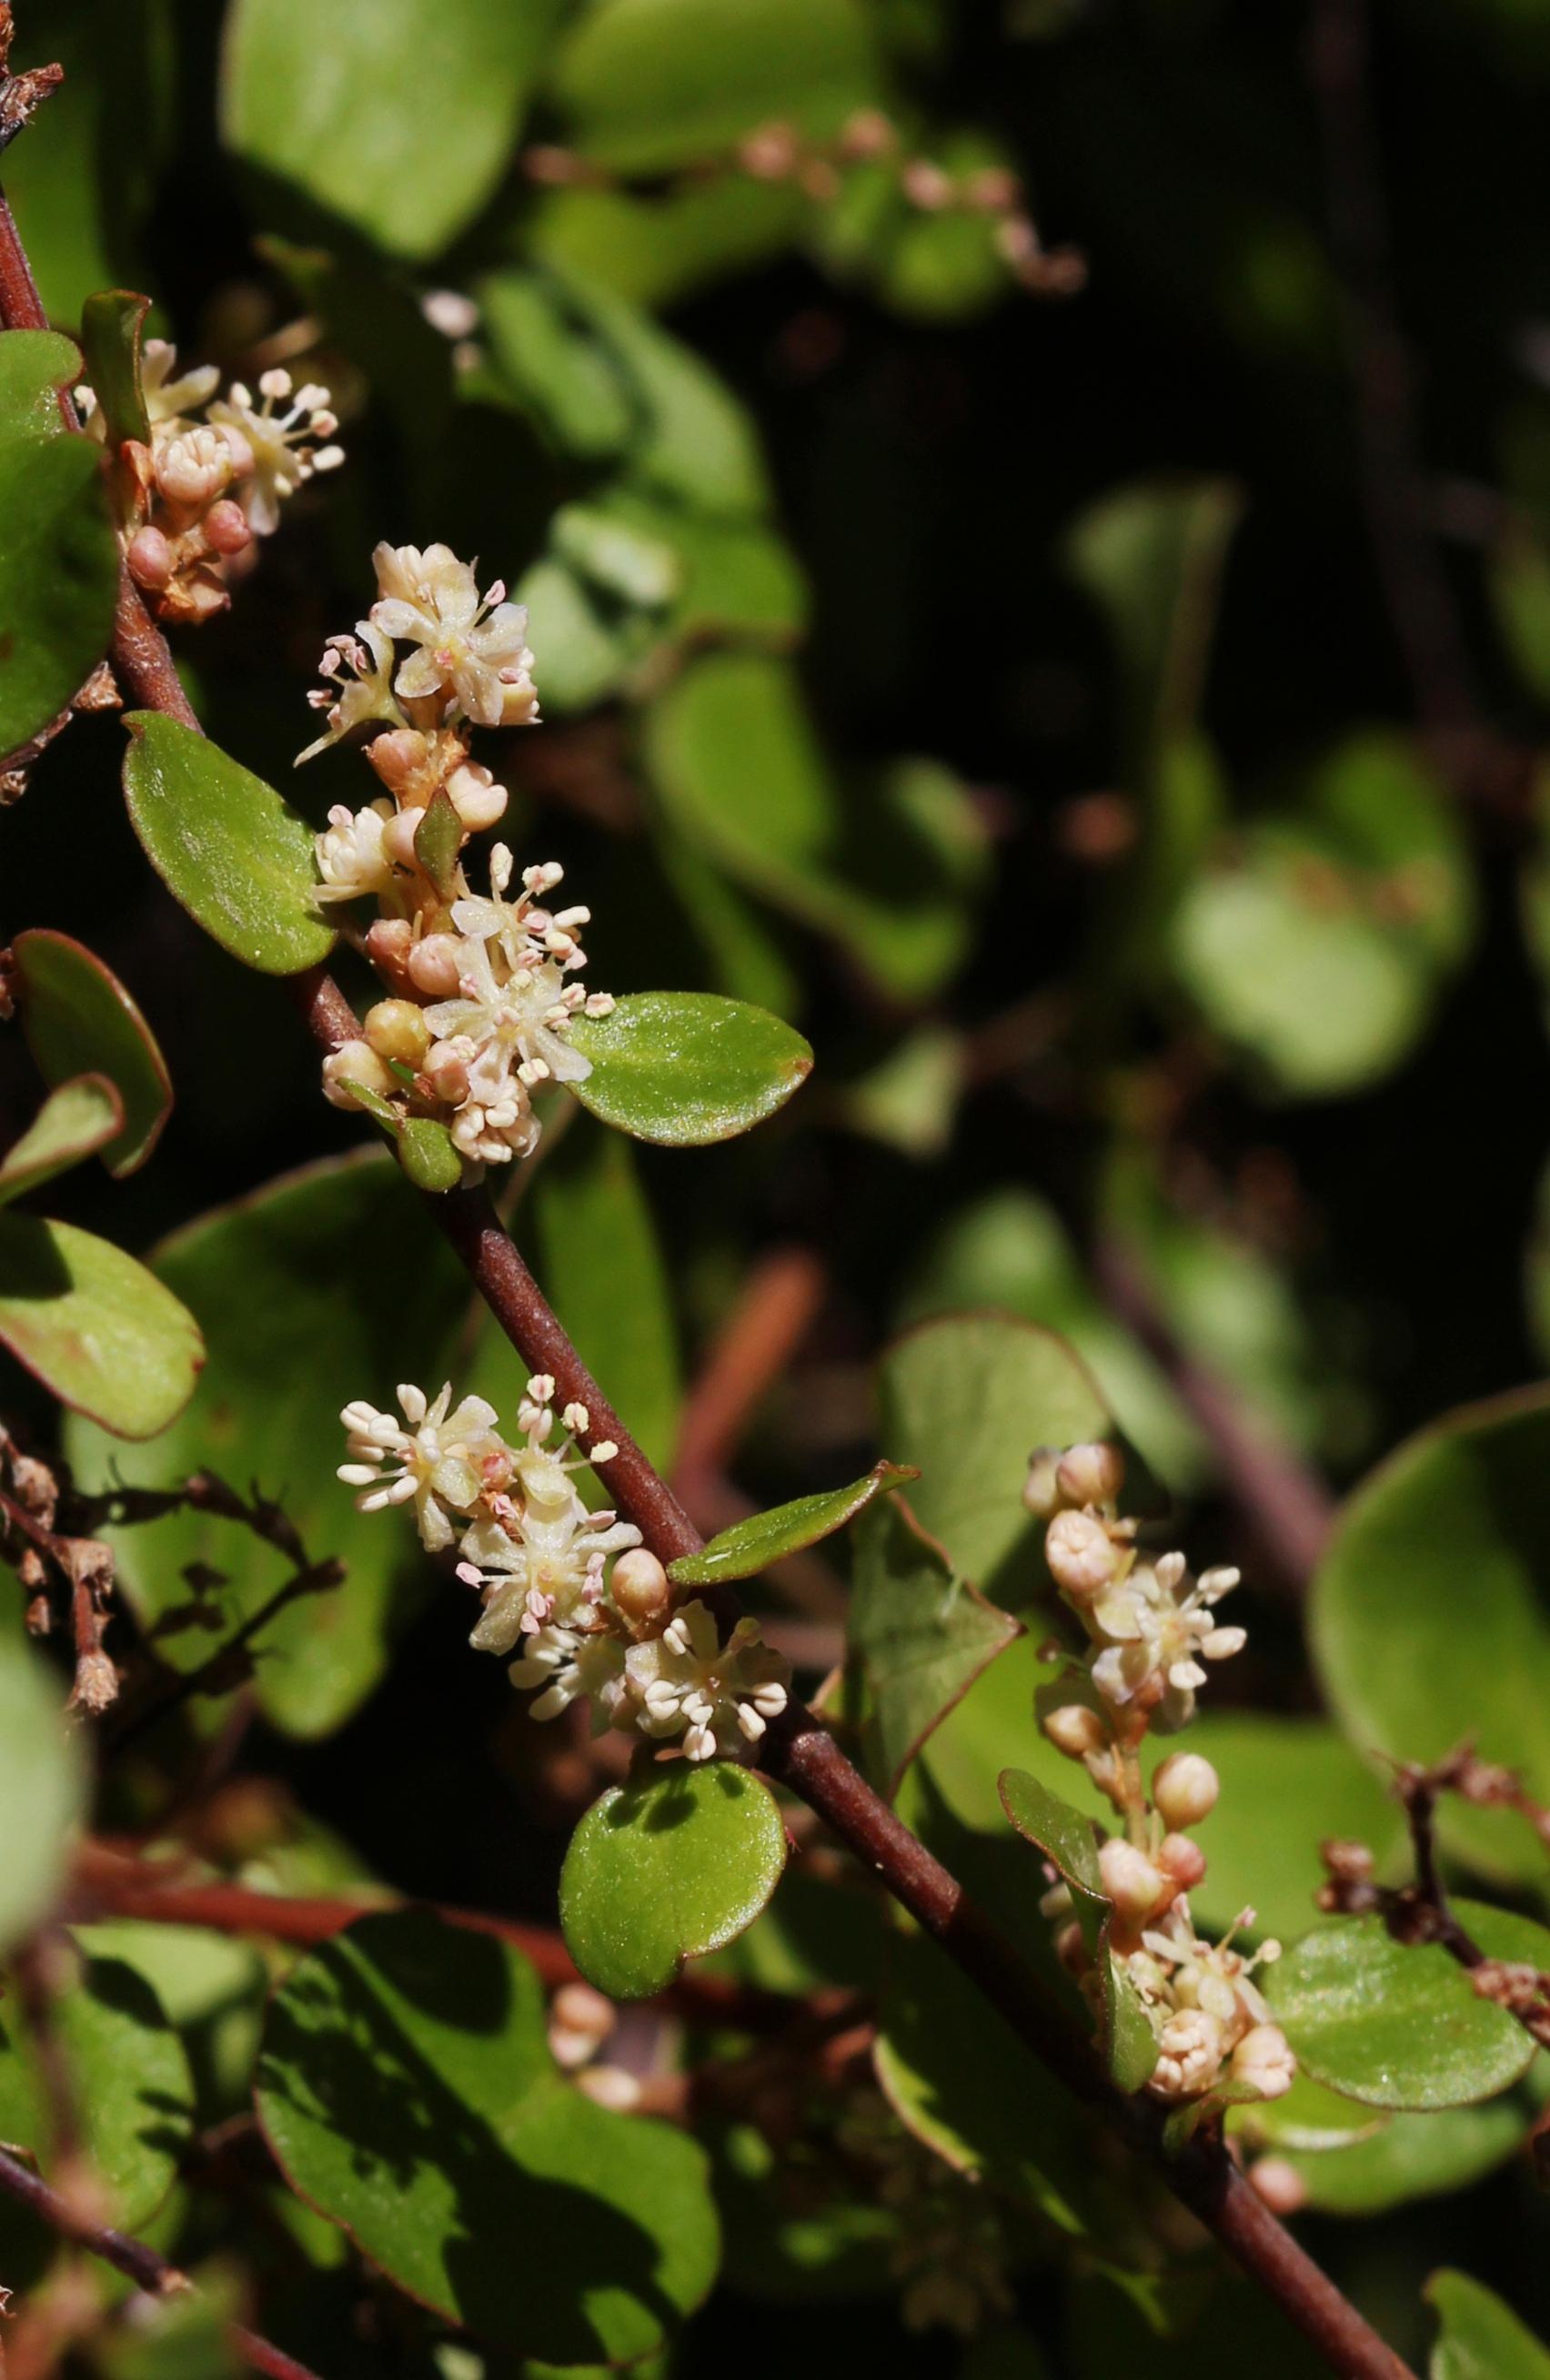 Muehlenbeckia_complexa_in_flower_T2i_IMG_104_1452.jpg